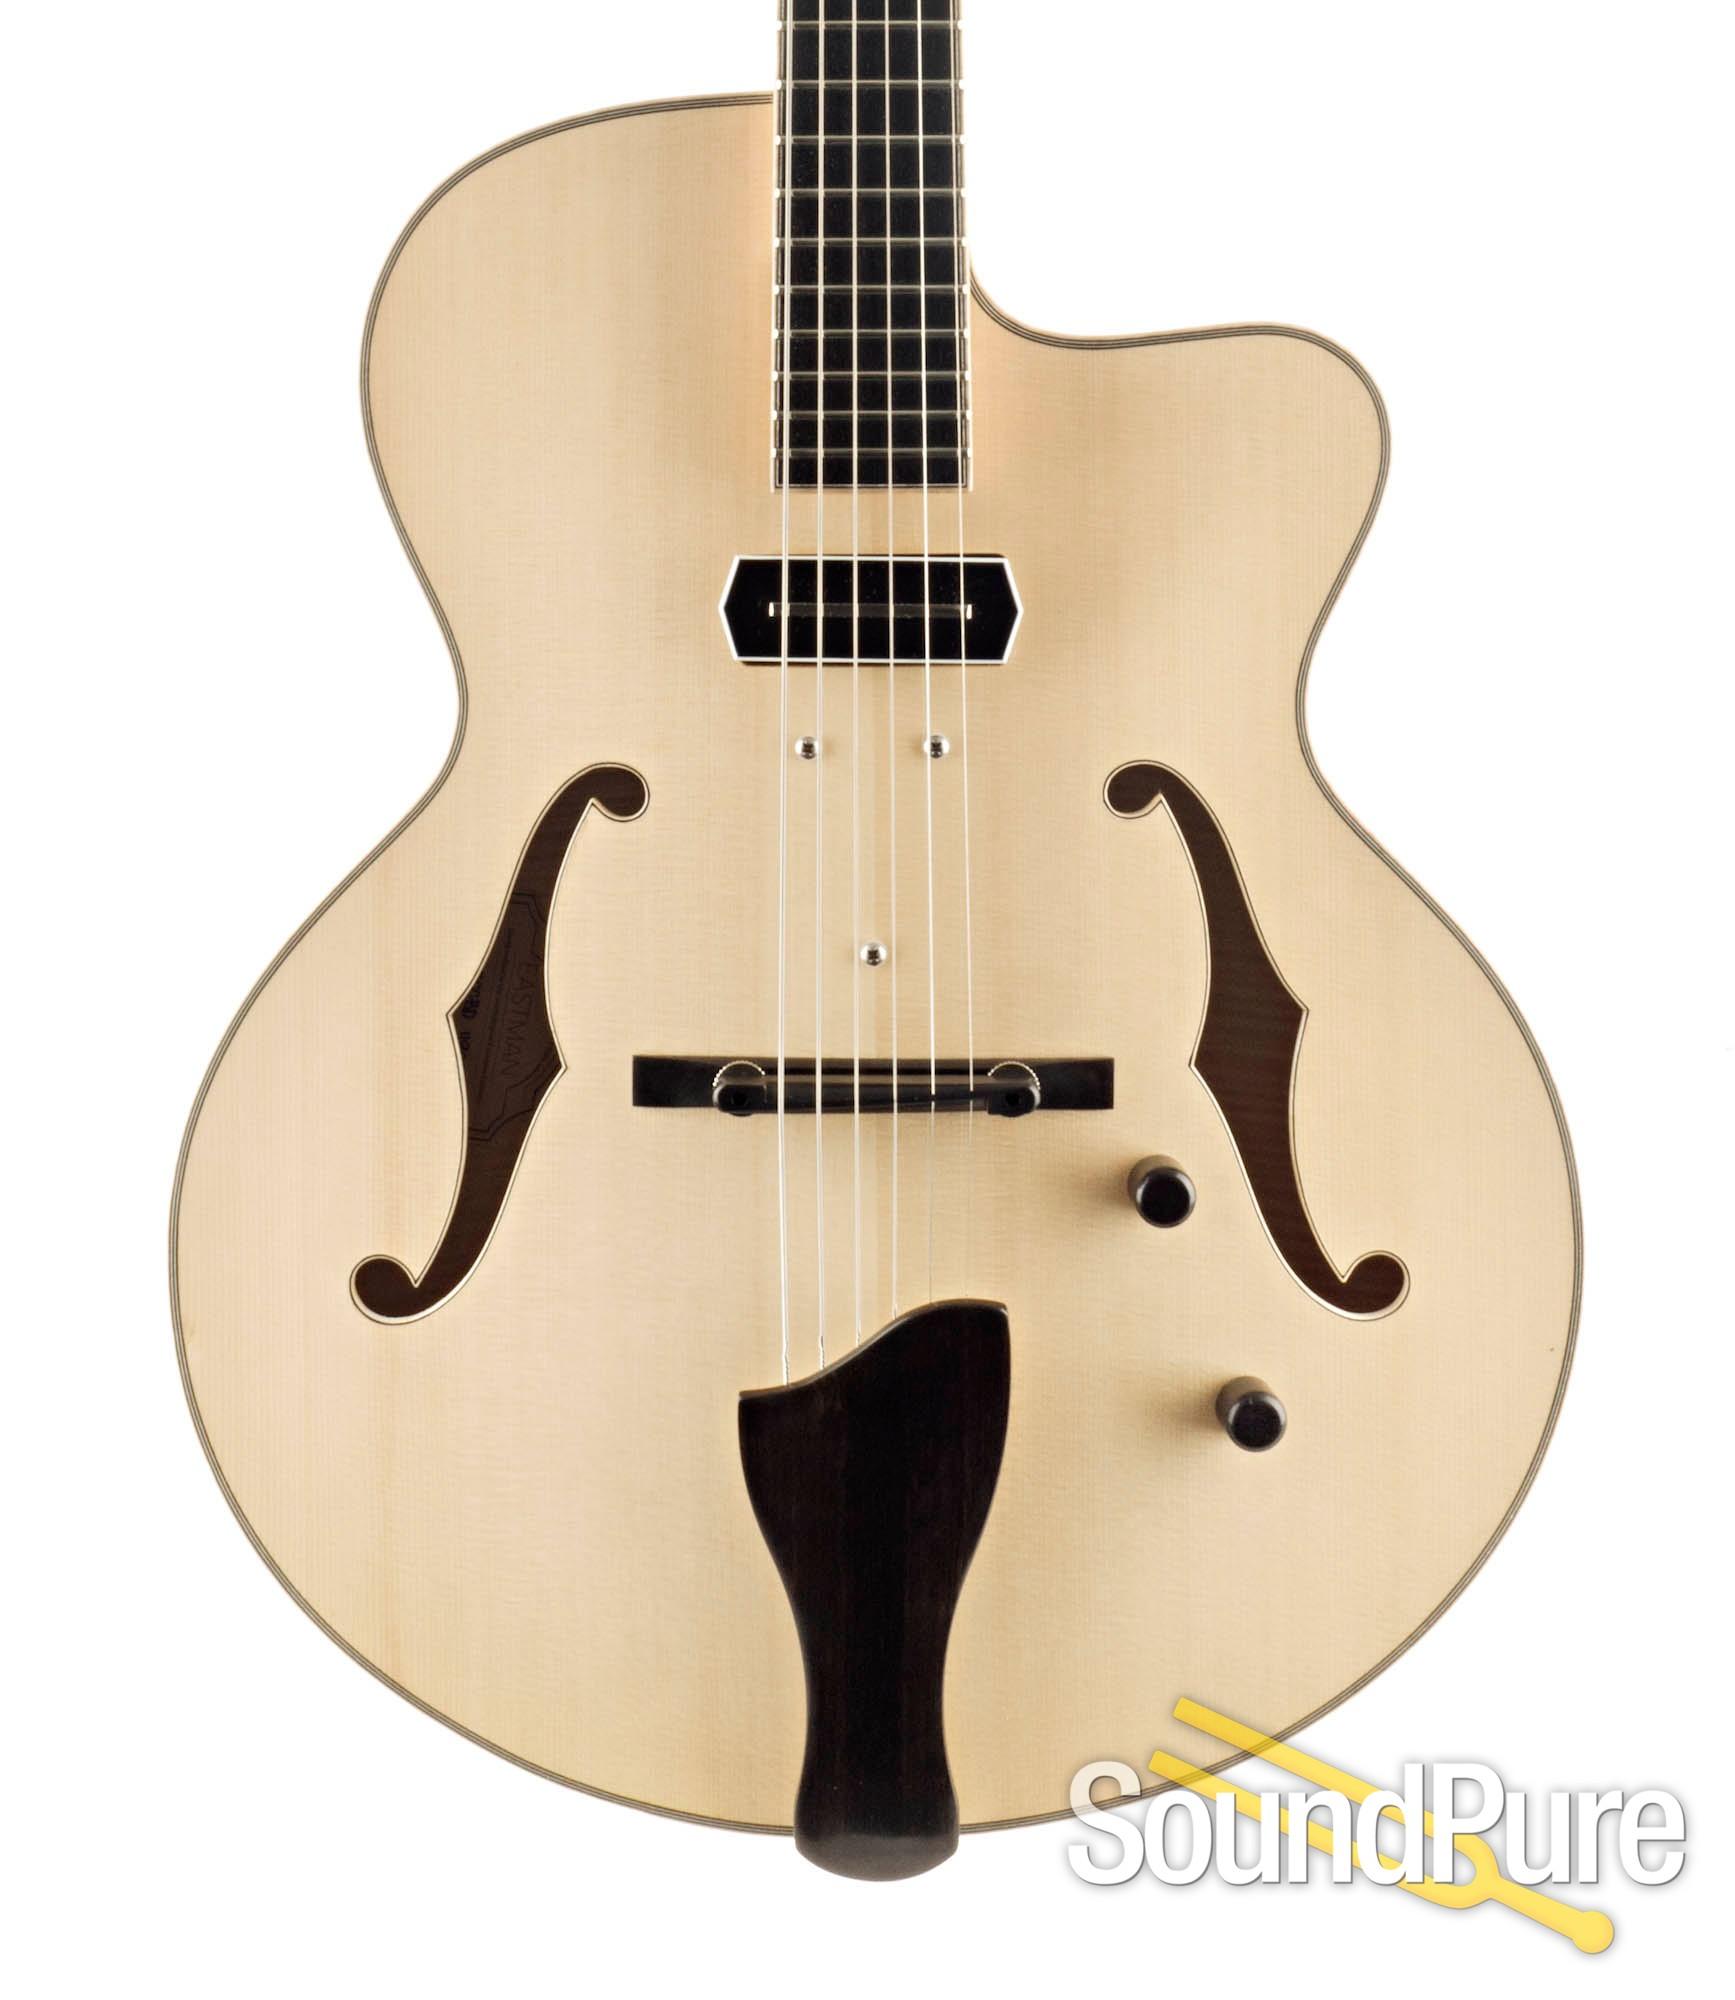 Eastman AR905CC-BD Cutaway Archtop #119030   Soundpure com